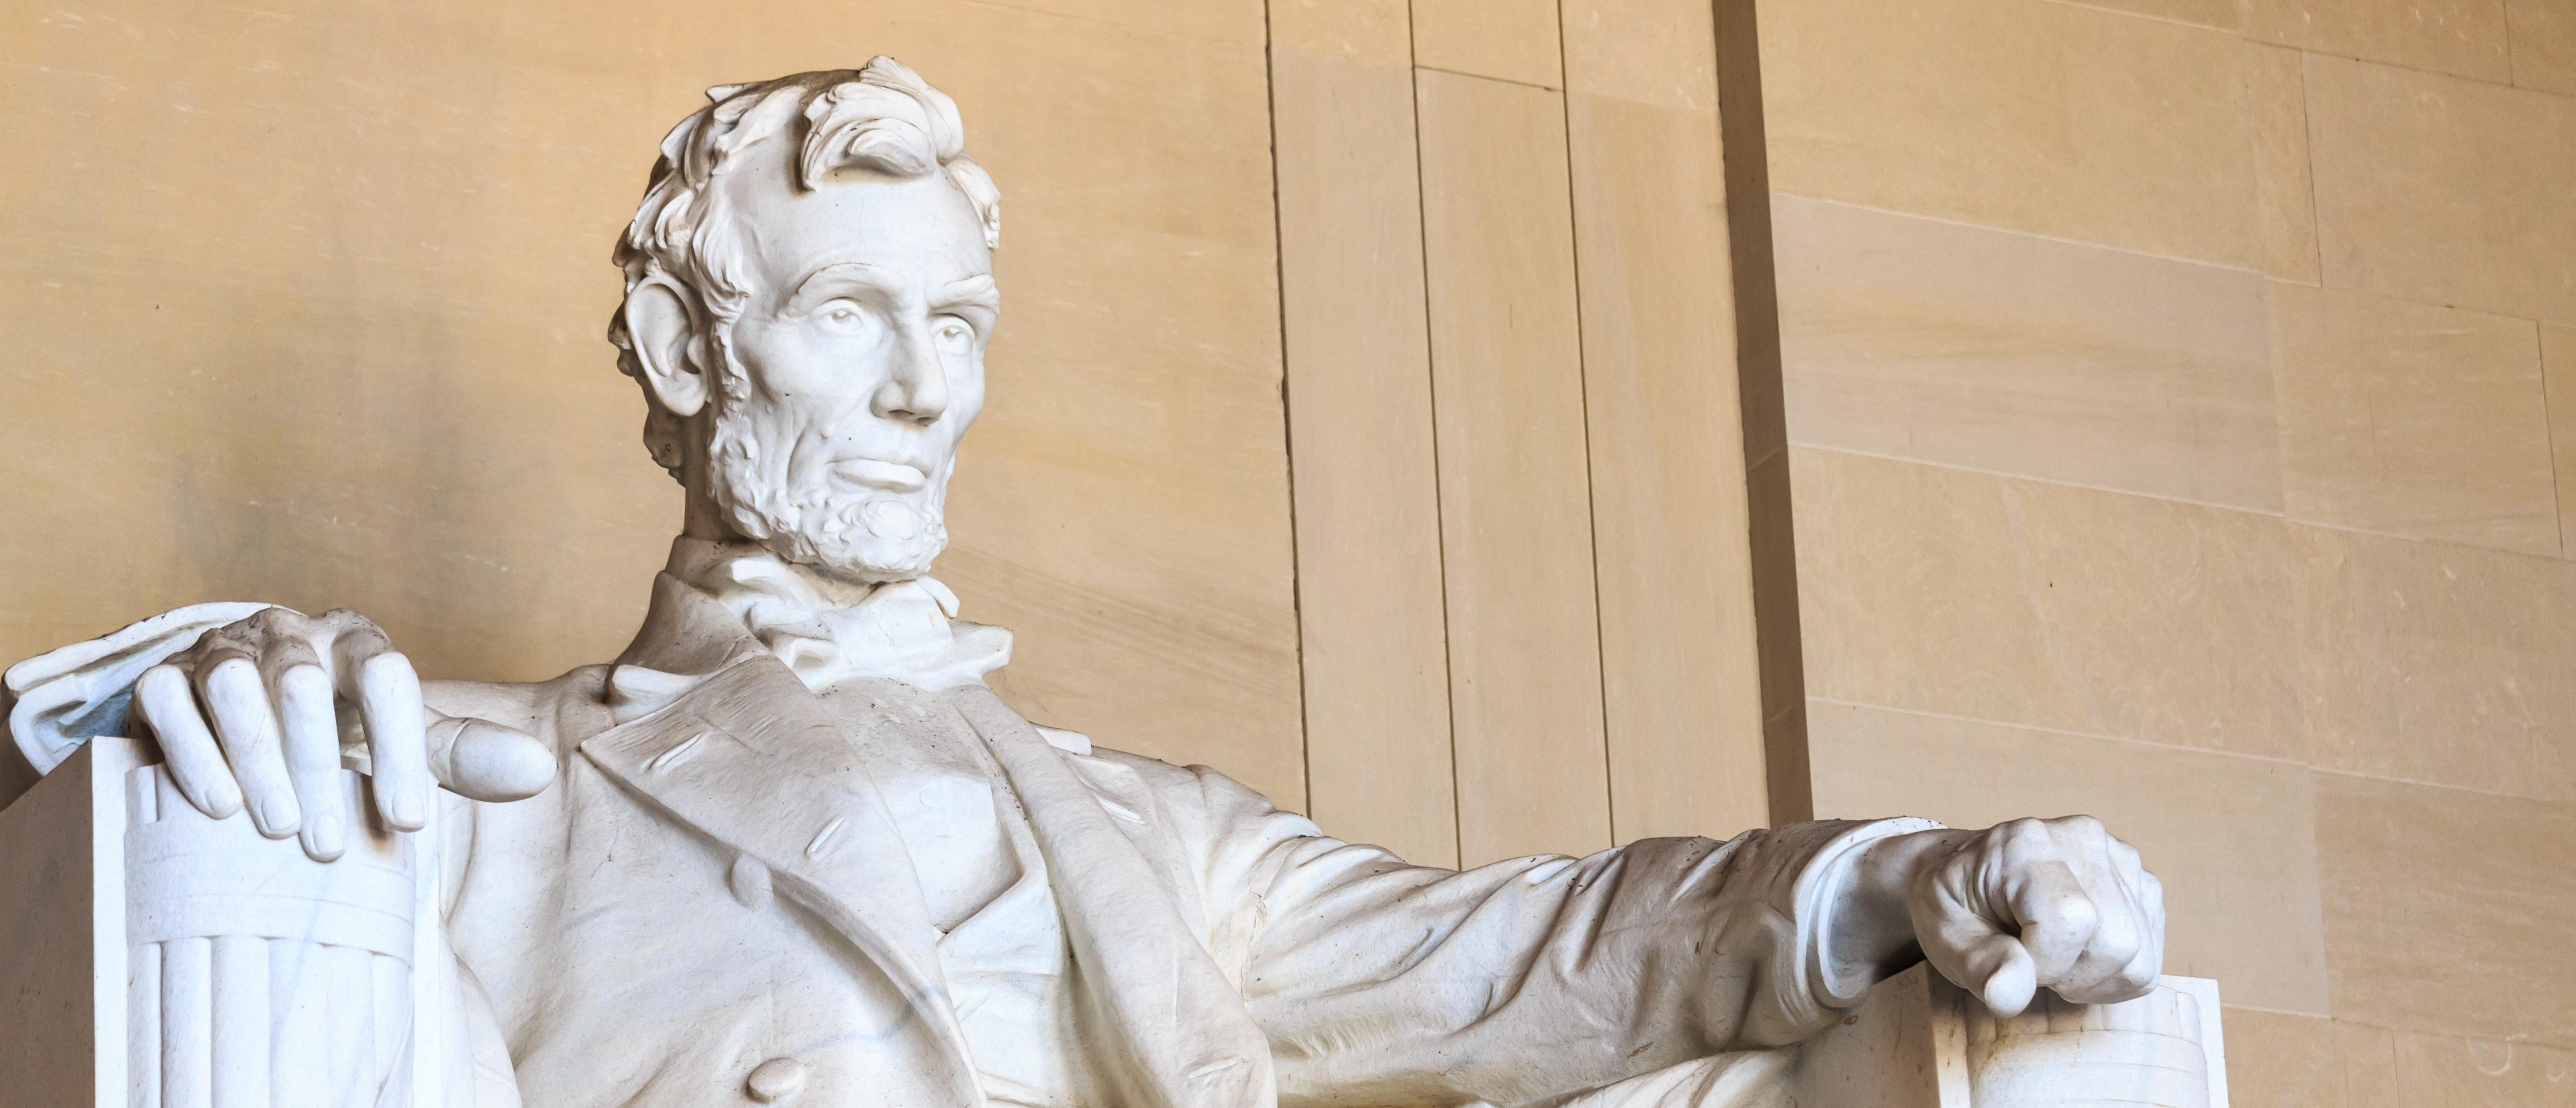 Abraham Lincoln monument in Washington, DC. Shutterstock